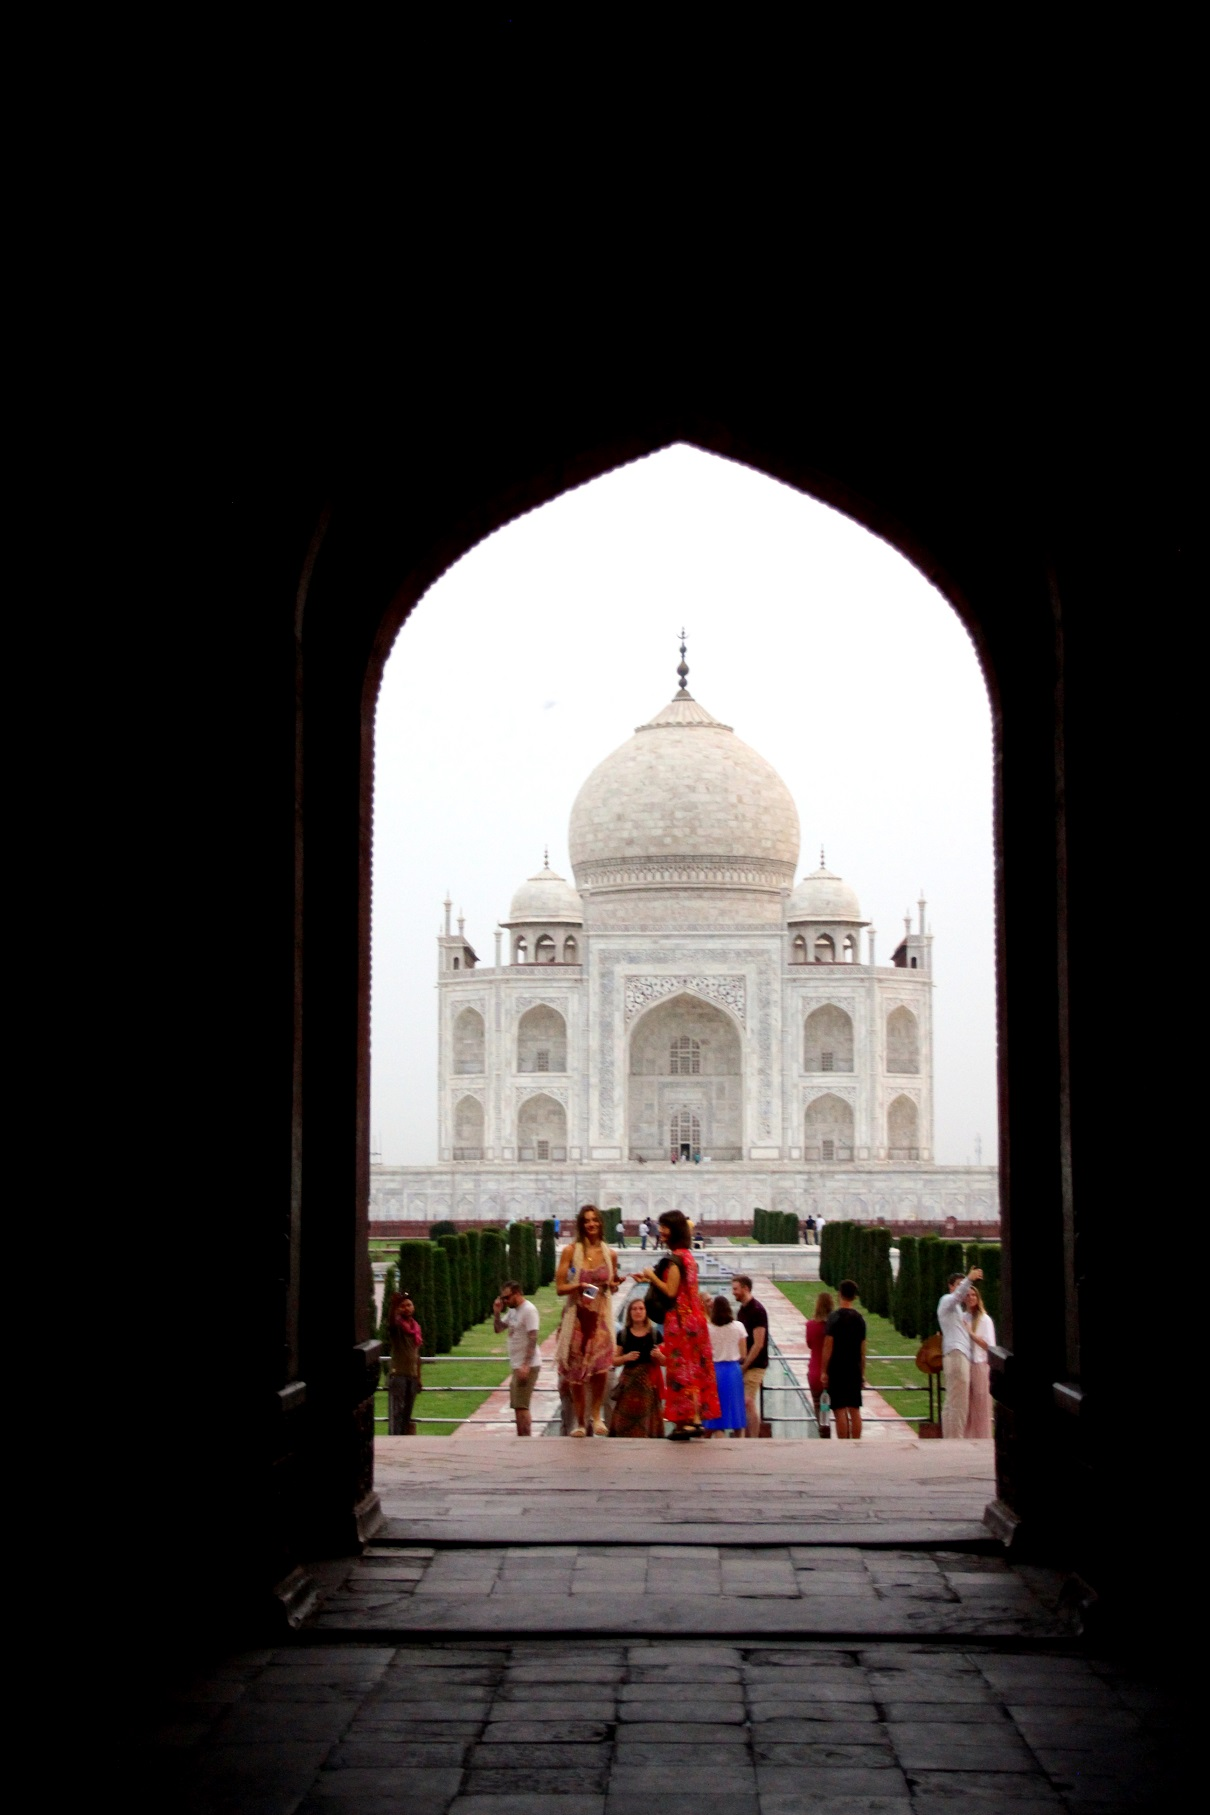 Buntes Taj Mahal Indien Bild